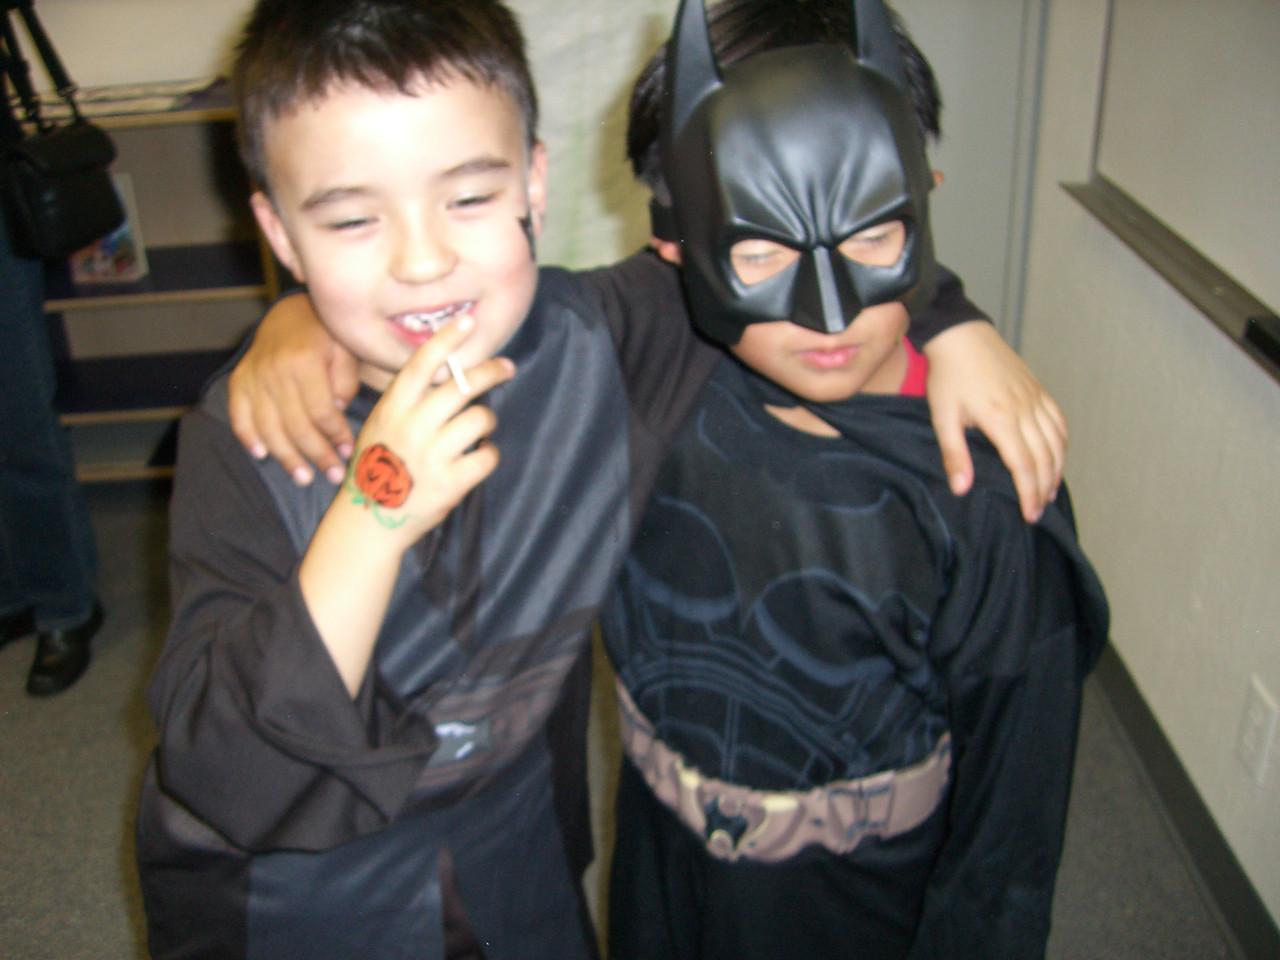 Frank-Joseph Obi Wan and Batman have always been buddies